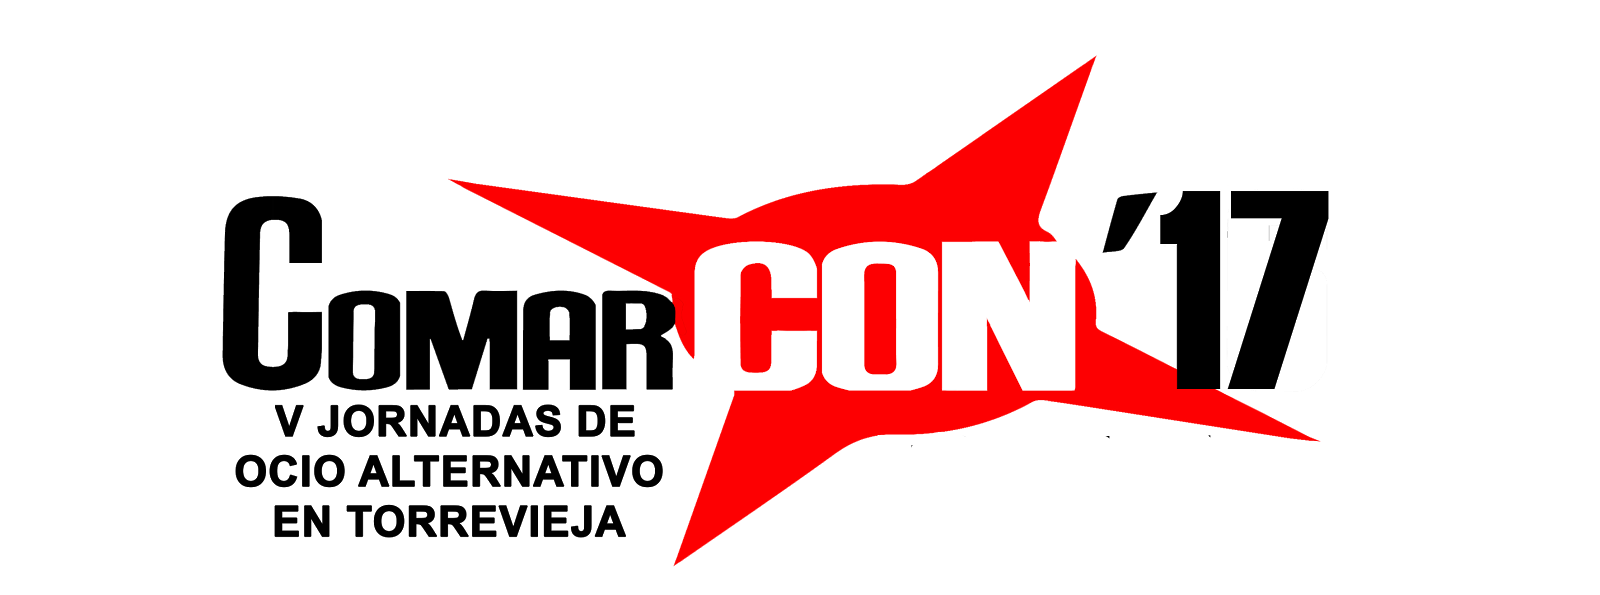 La ComarCON